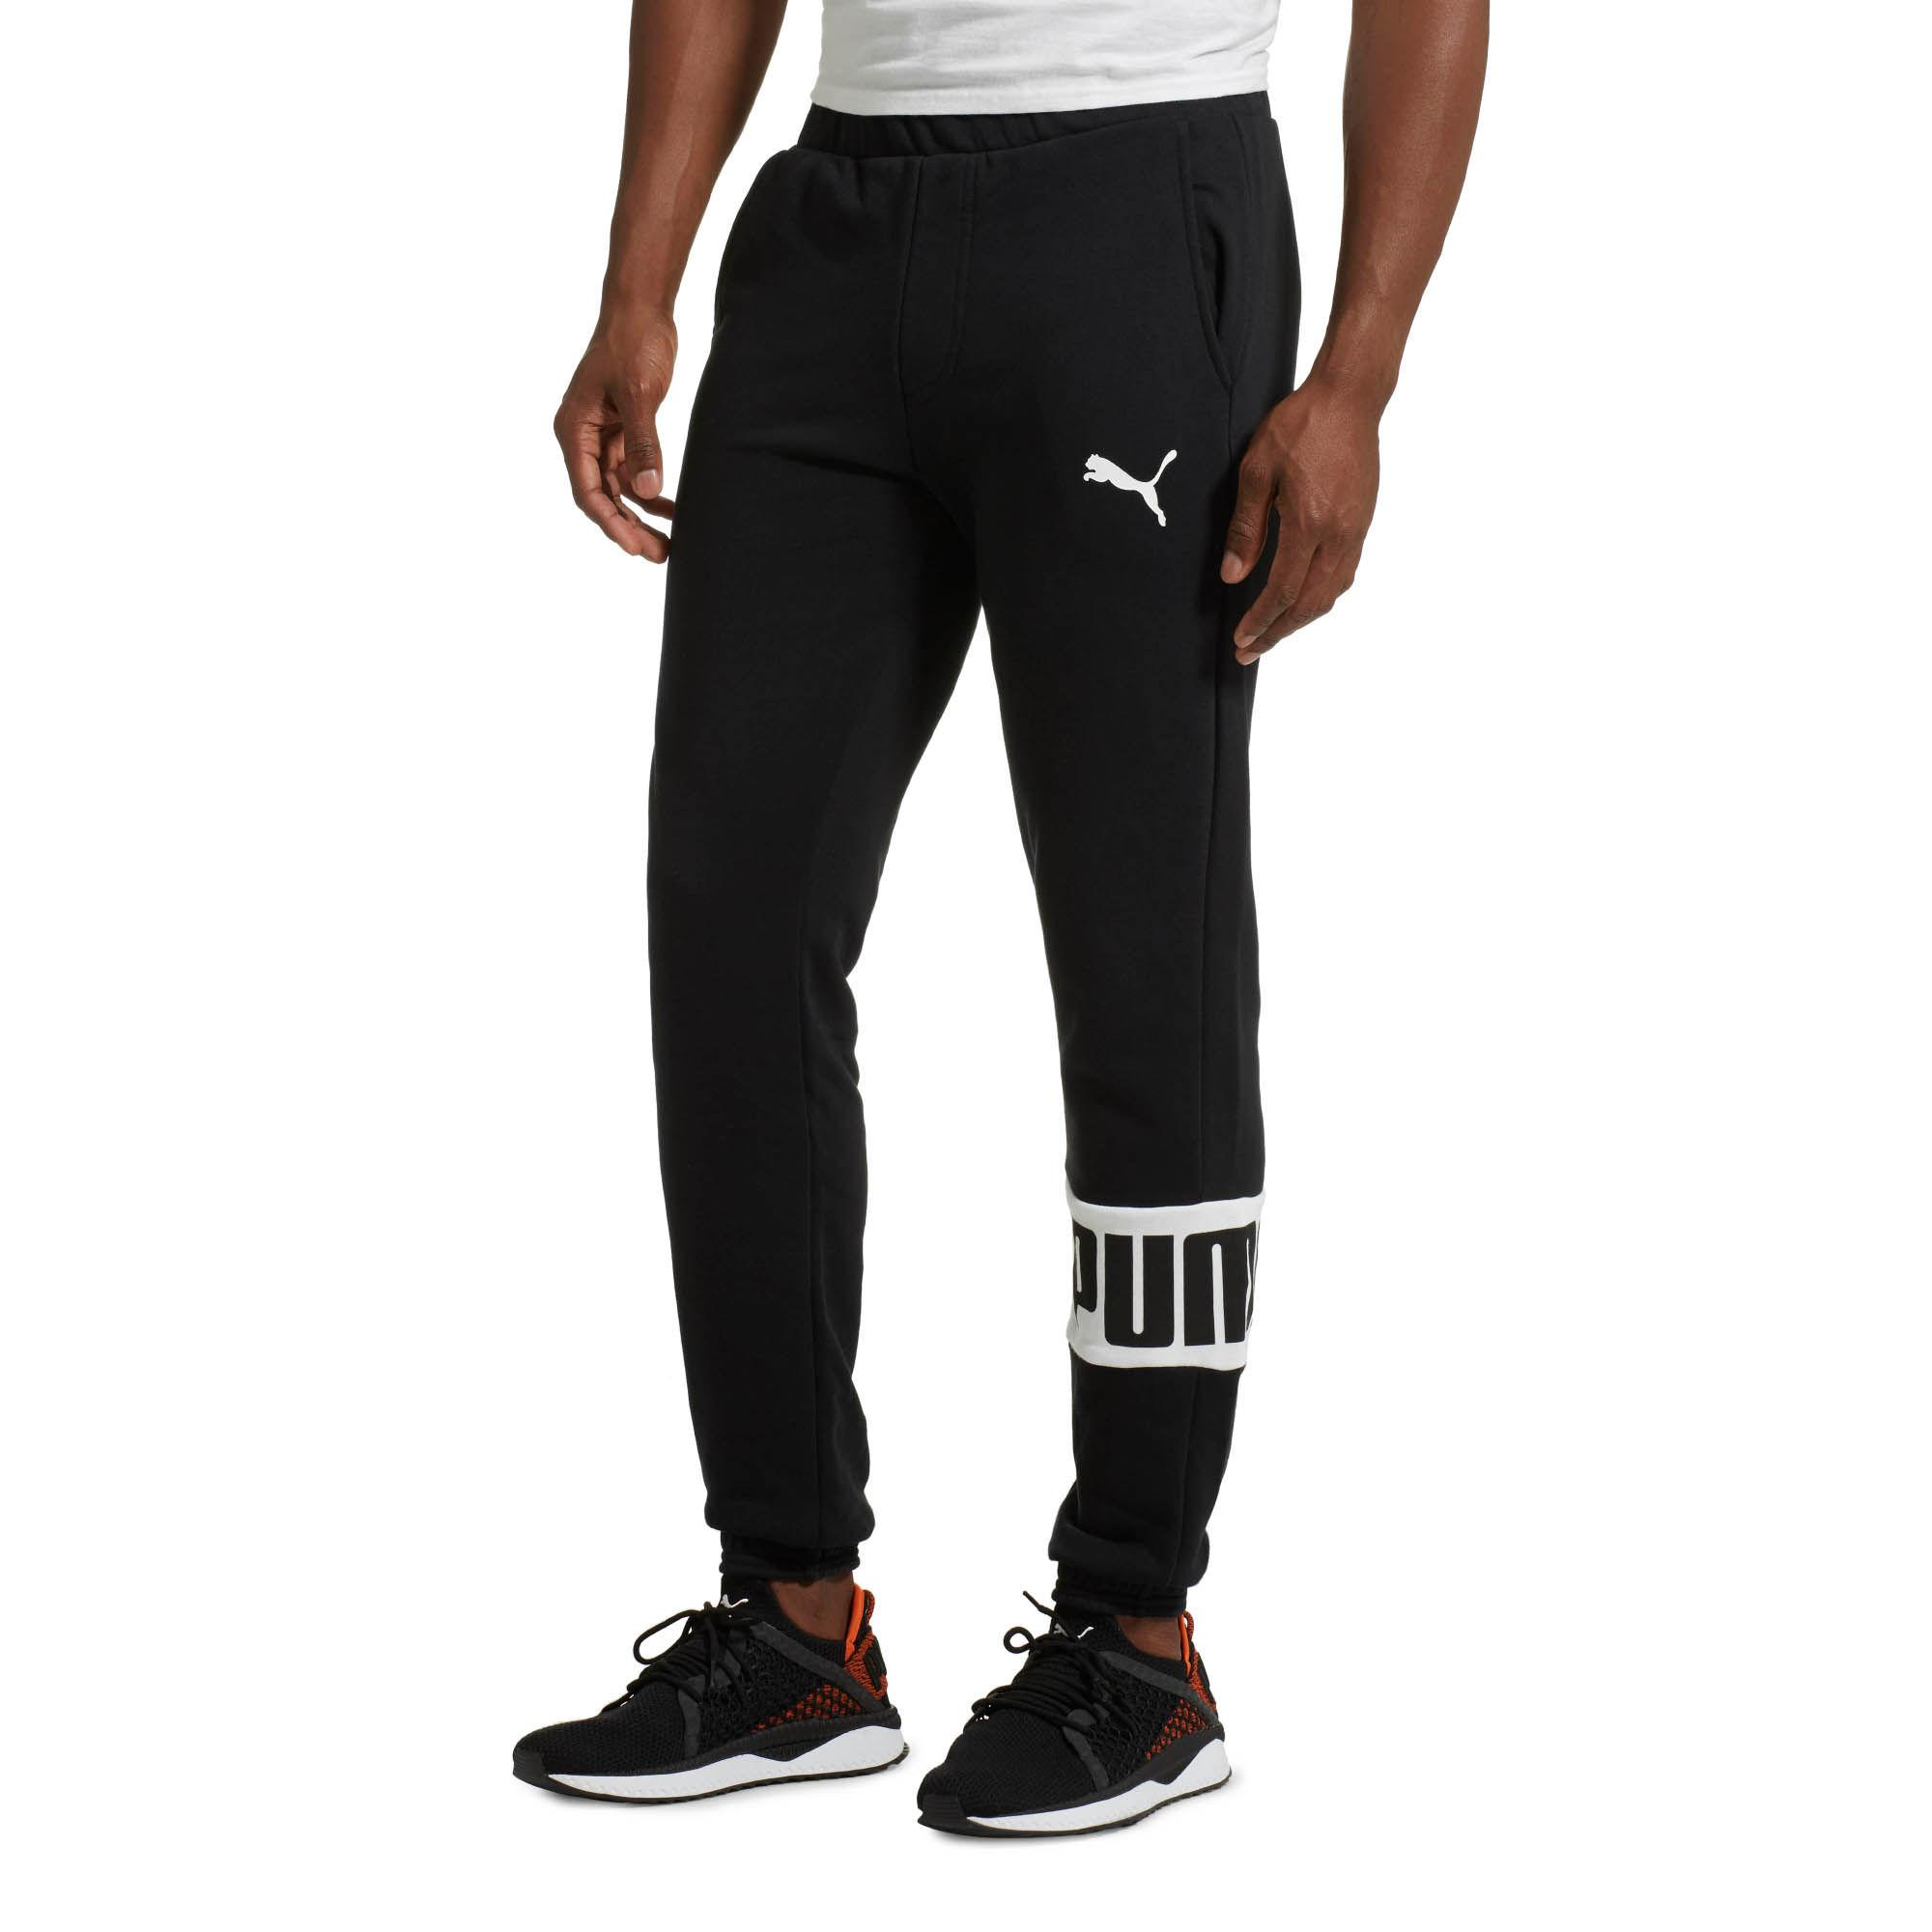 PUMA Cotton Men's Rebel Sweatpants in Black for Men - Lyst